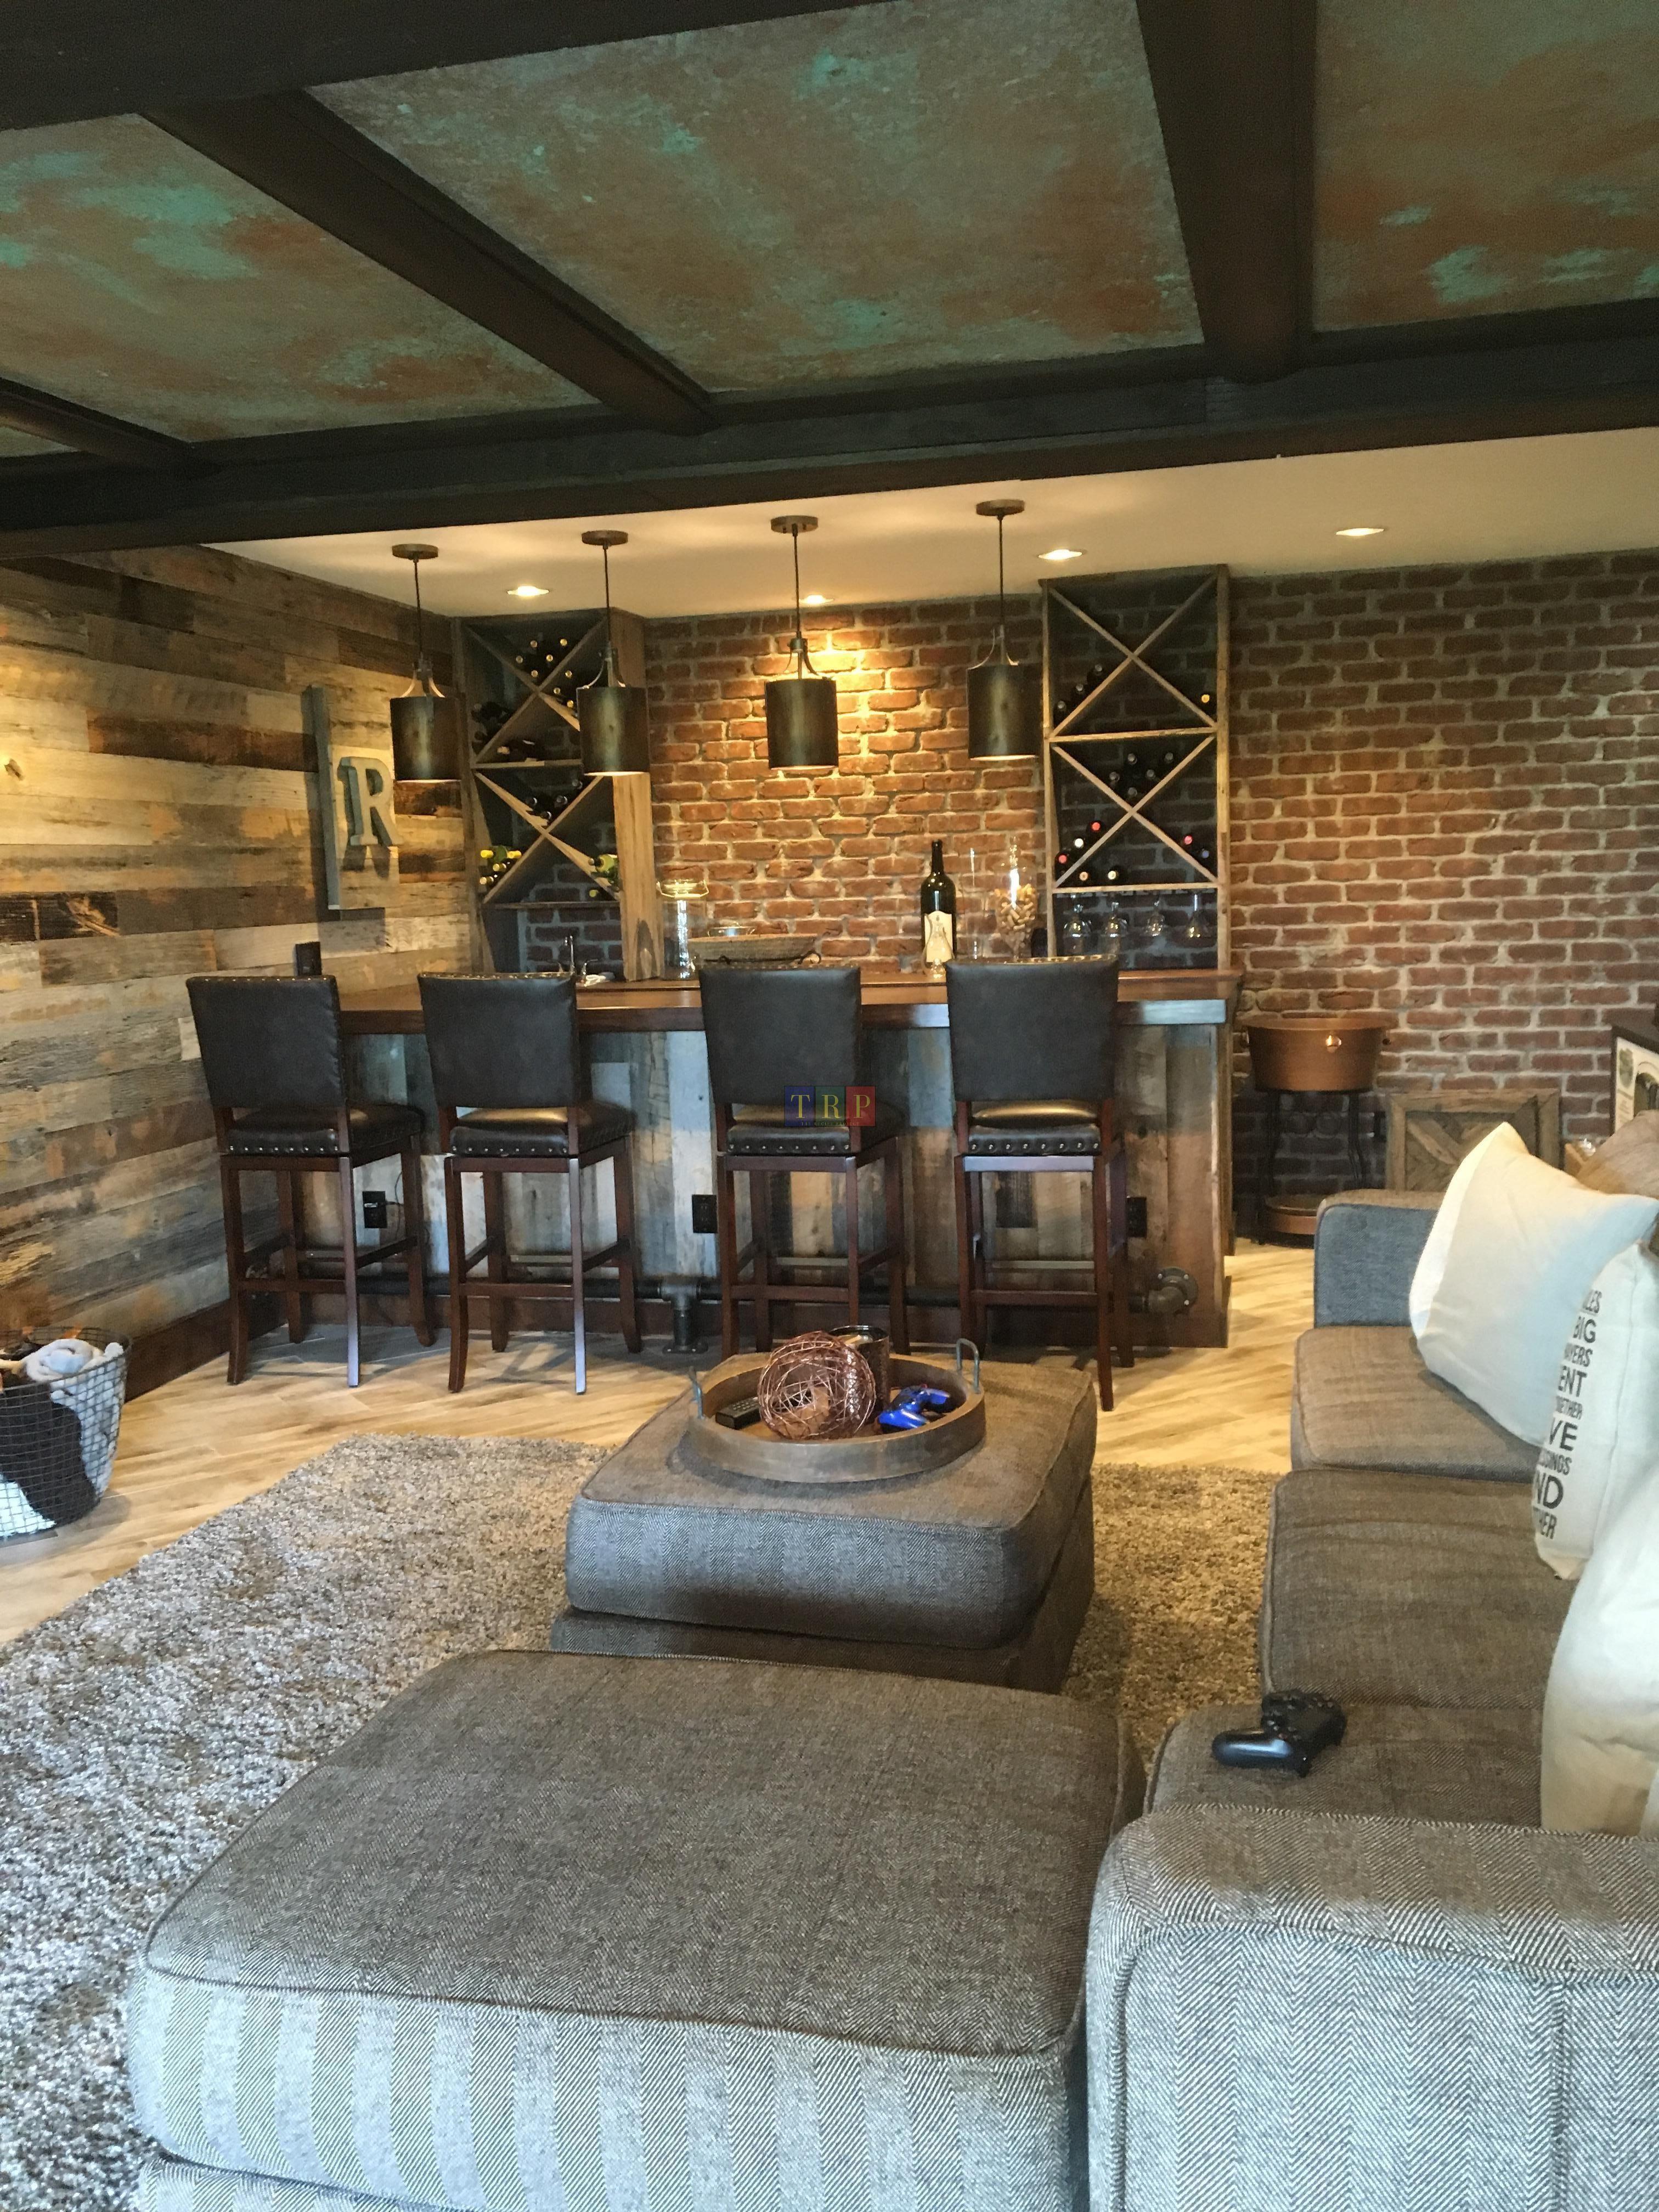 Finish Basement Ideas Step To Finish Basement Floor And Ceiling Rustic Basement Home Theater Basement Basement Design